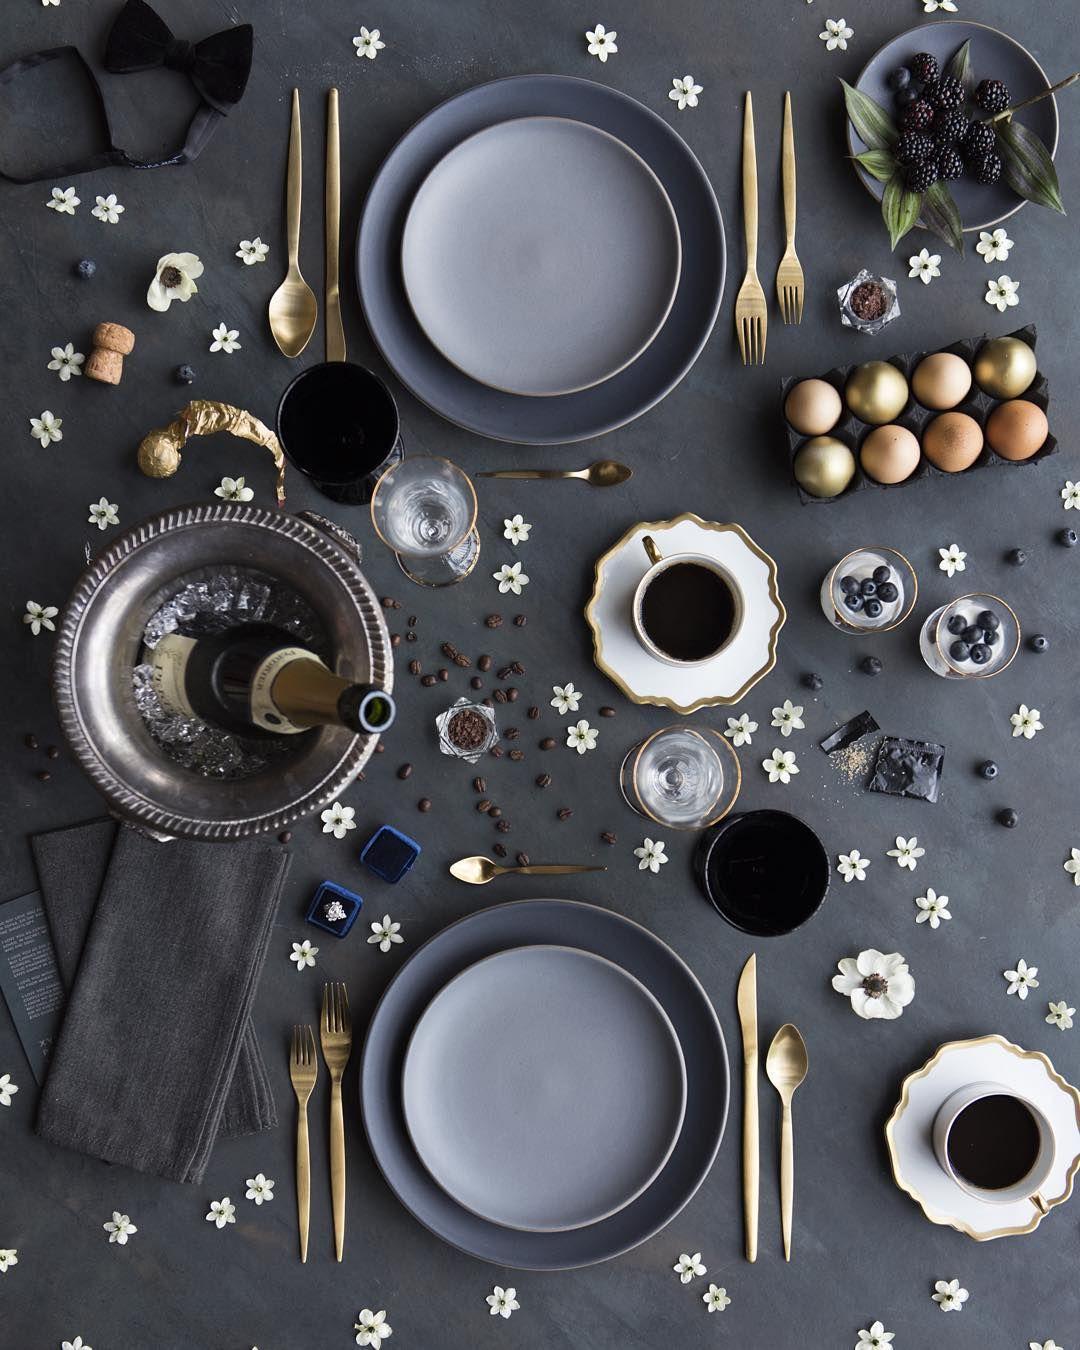 LA Based Luxury Tabletop Curation + Design Brand. Event